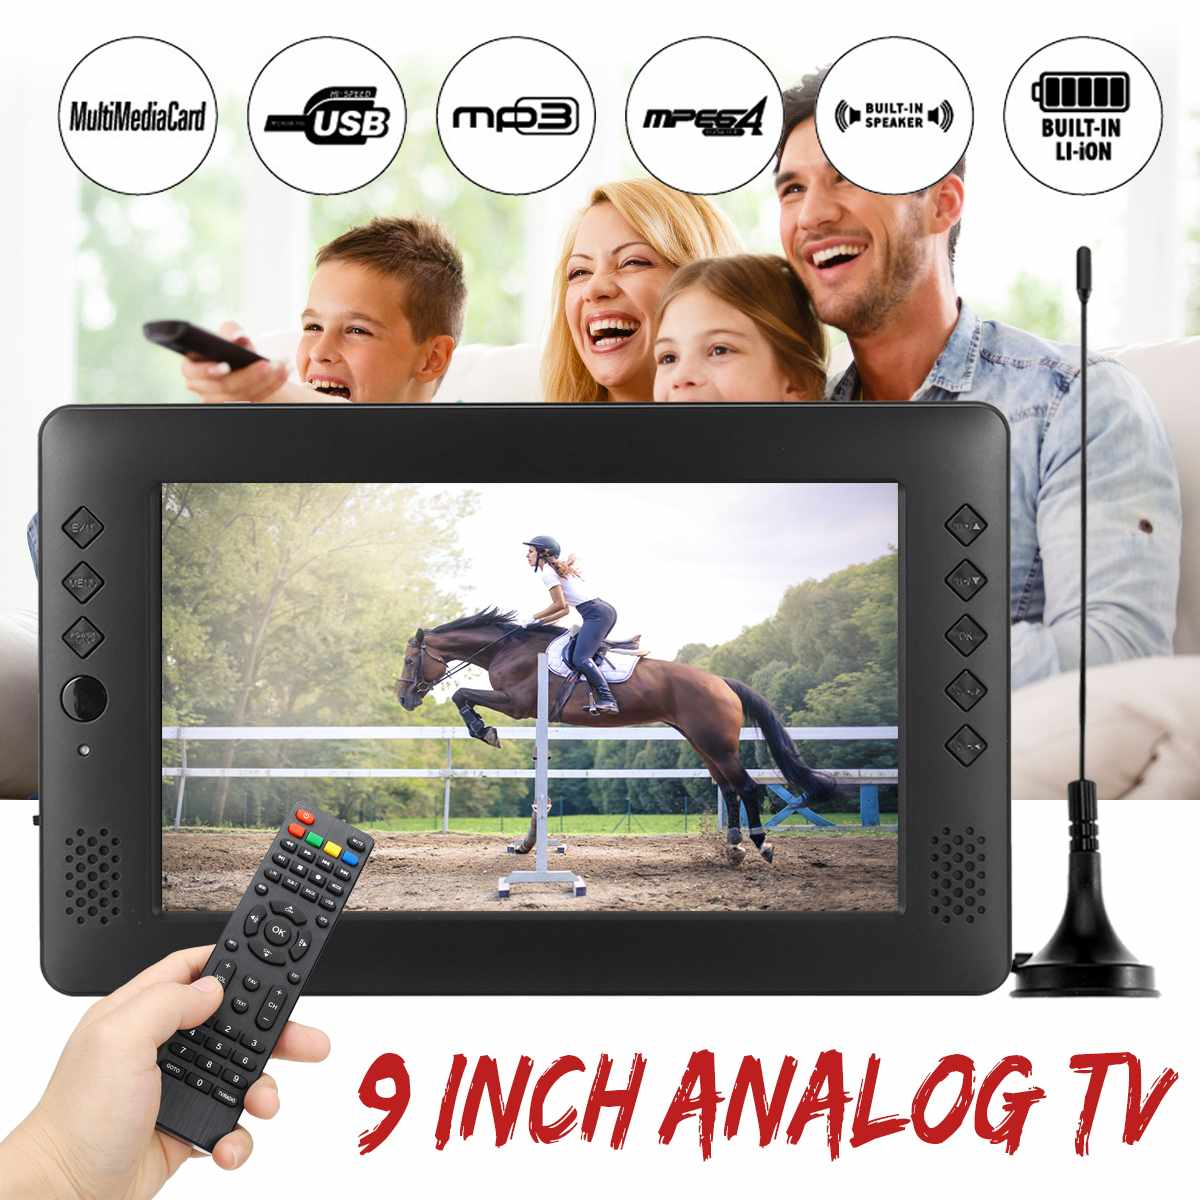 12V 9 zoll HD Tragbare Mini WiFi Digital und Analog TV DVB-T2 DVB-T DTV ATV Auto Smart Fernsehen Unterstützung USB TF Karte MP4